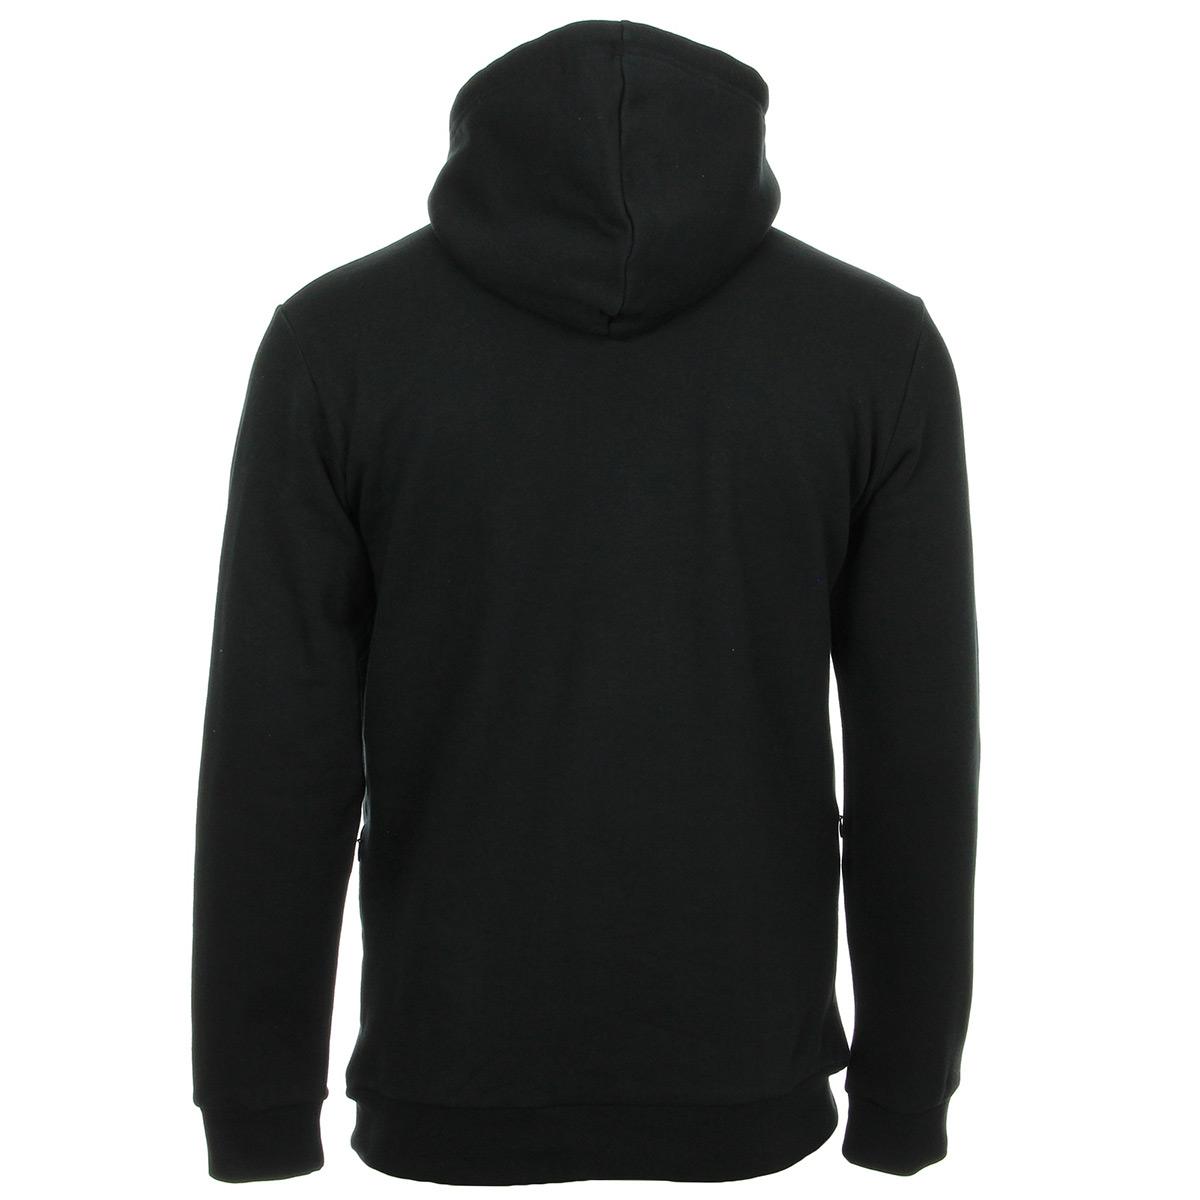 adidas Trefoil Warm Up Hoodie CW1240, Sweats homme